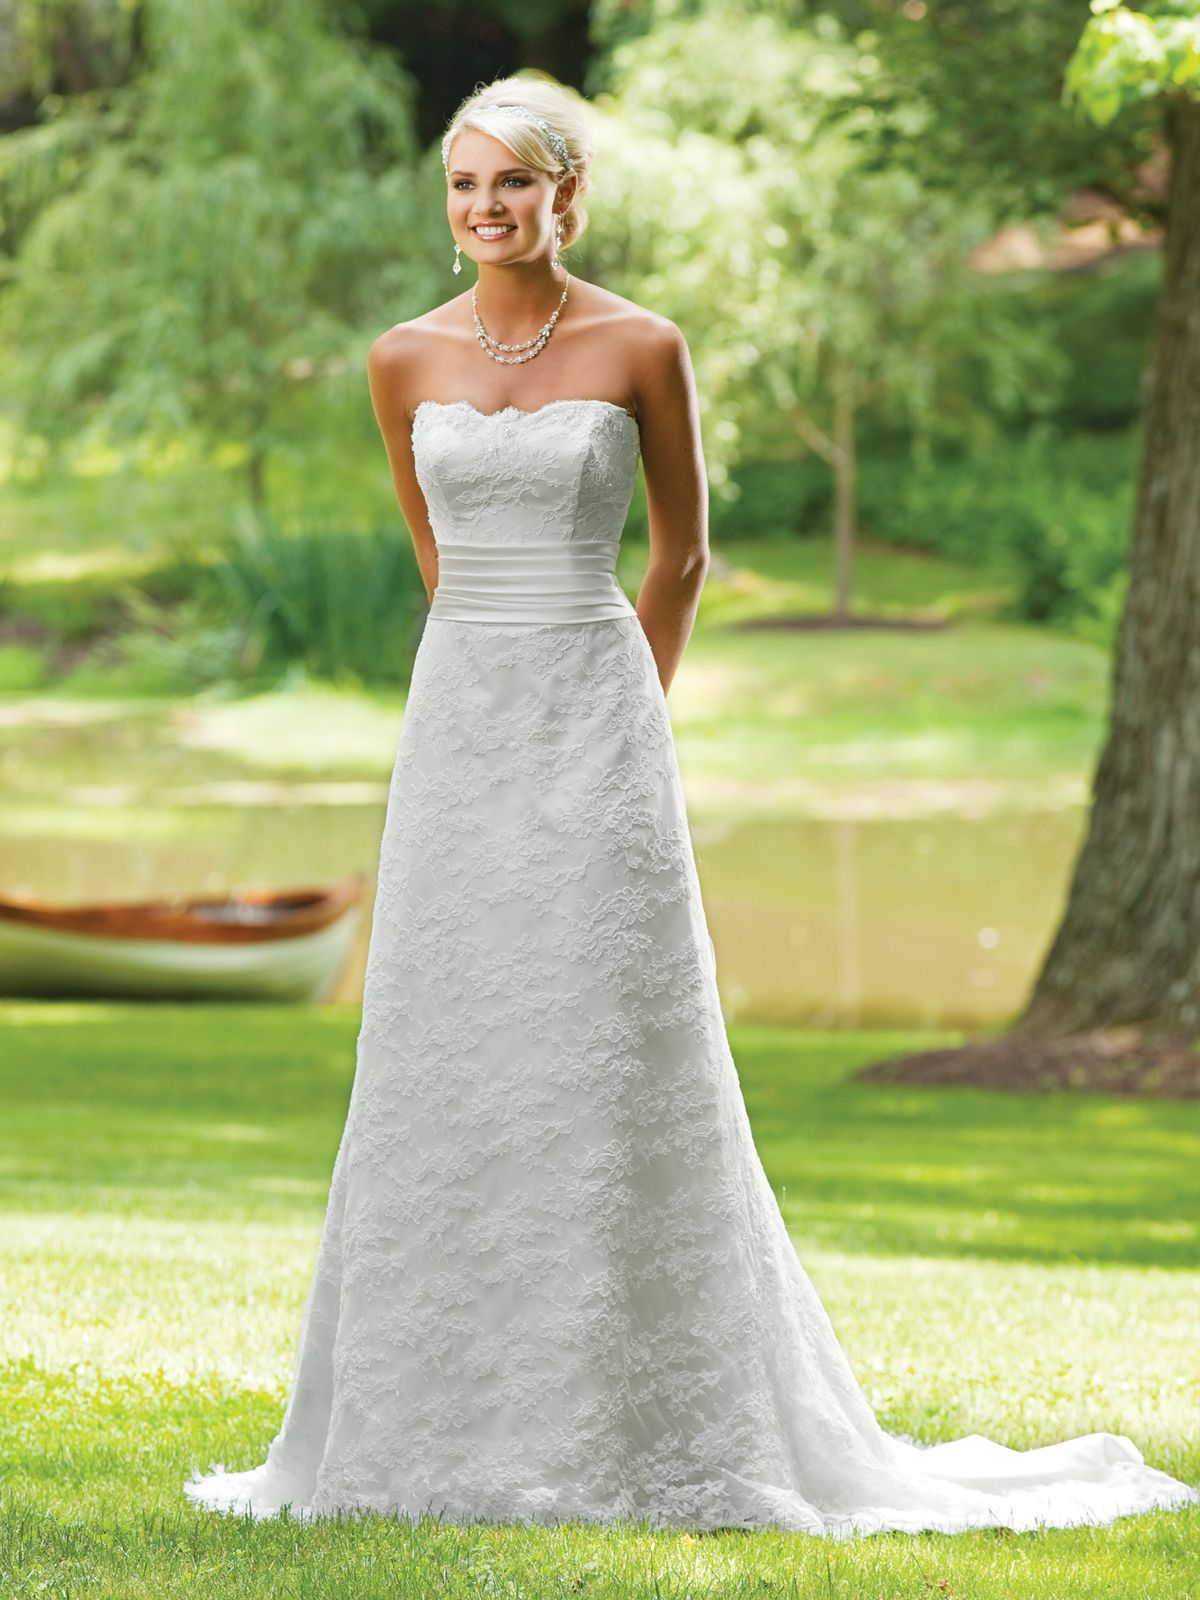 Scalloped lace wedding dress with cummerbund